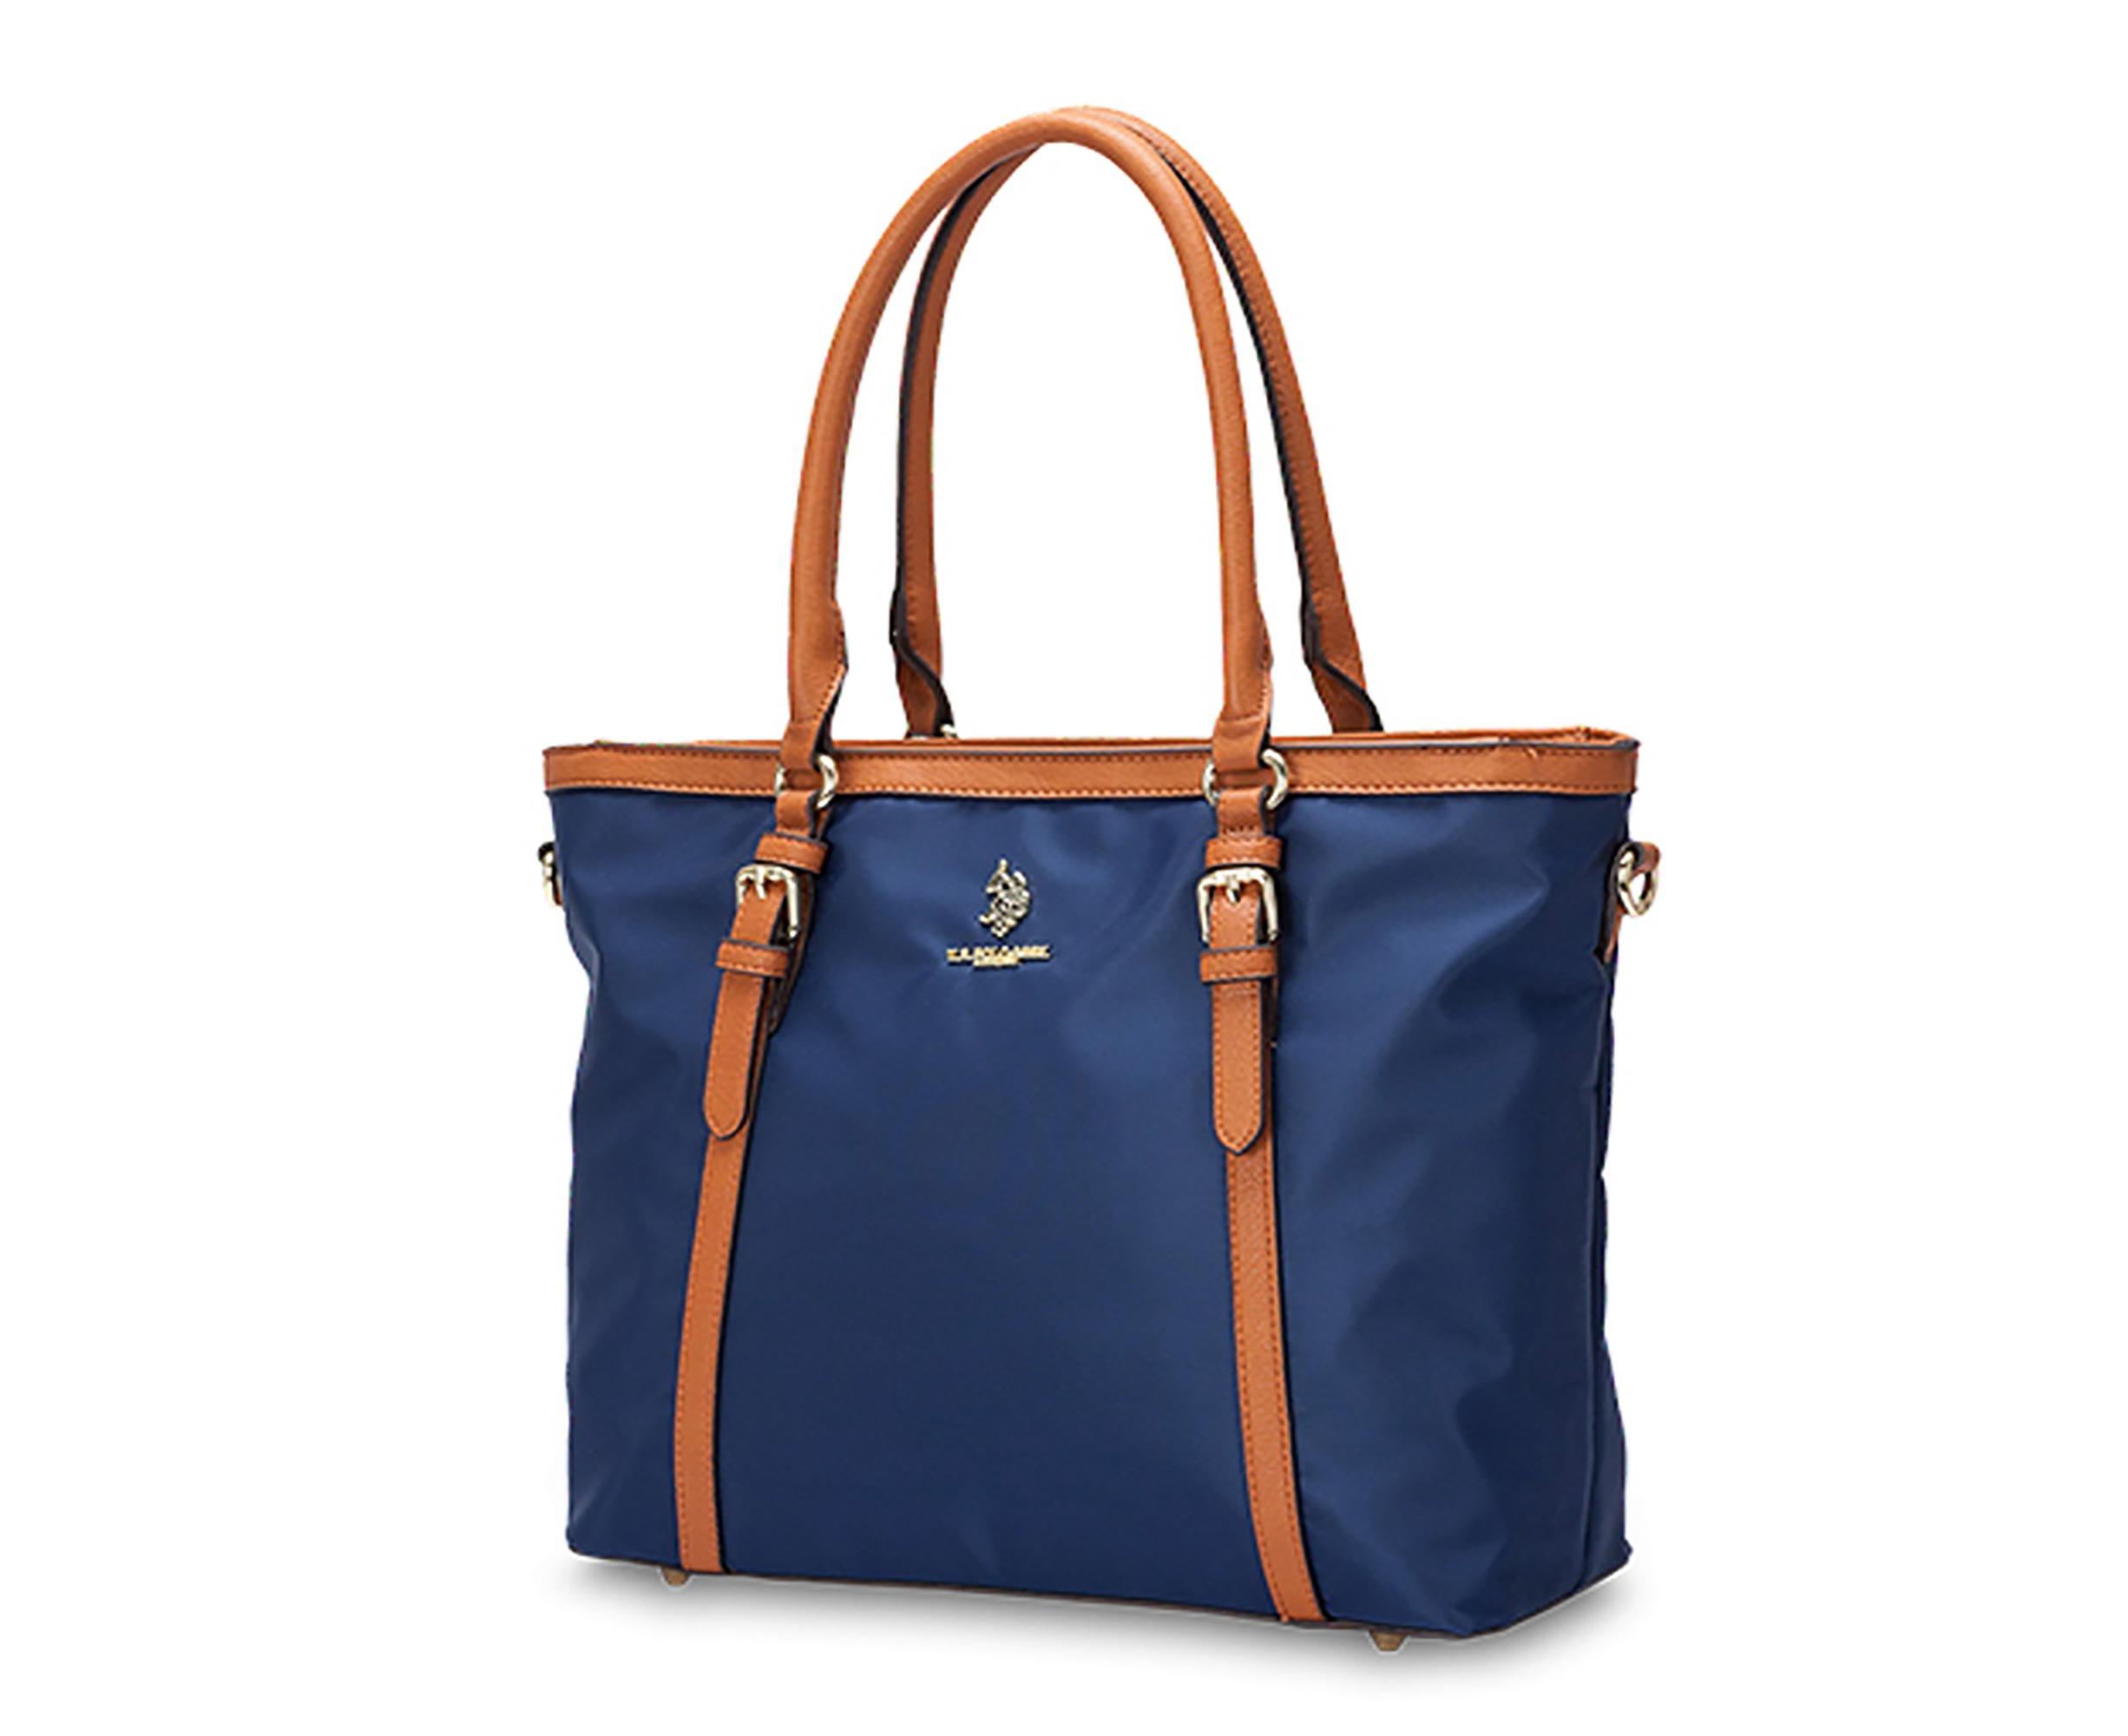 b218c5198b US POLO ASSN. Womens Houston Shopping Shoulder Handbag Satchel Tote Bag  Nylon With Strap - Navy